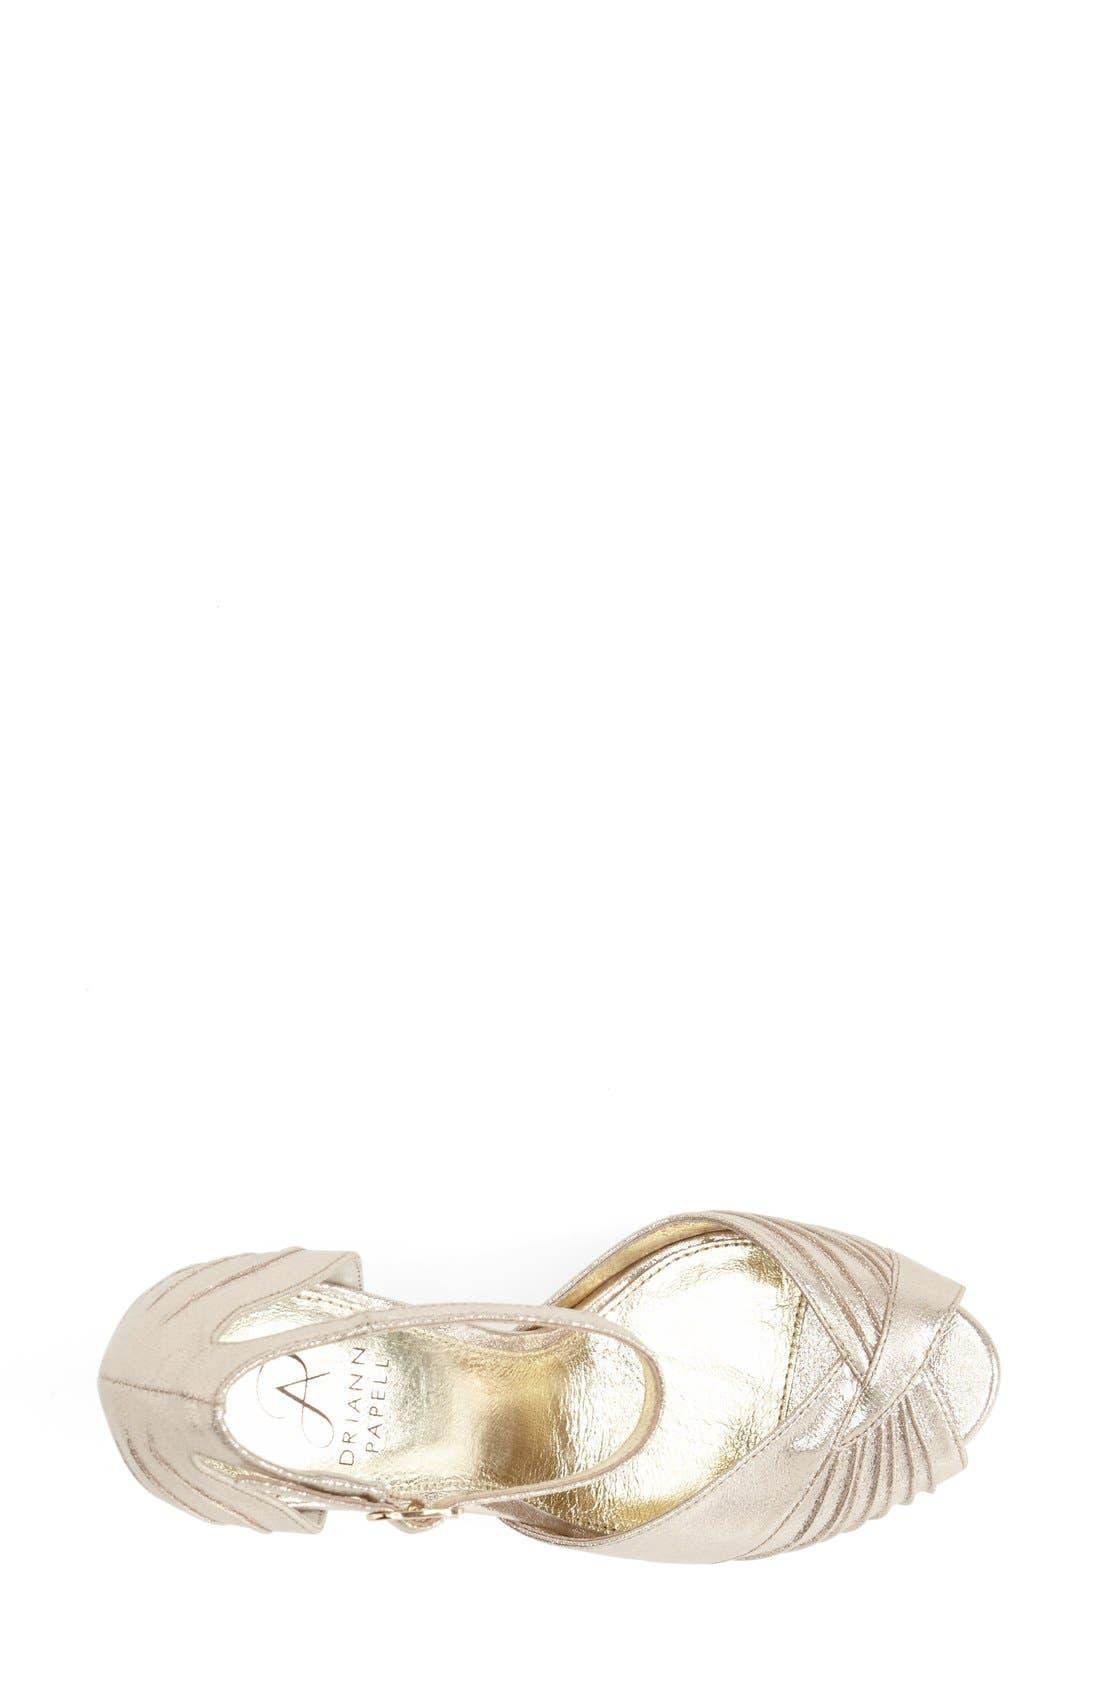 Alternate Image 3  - Adrianna Papell 'Rebecca' Platform Sandal (Women)